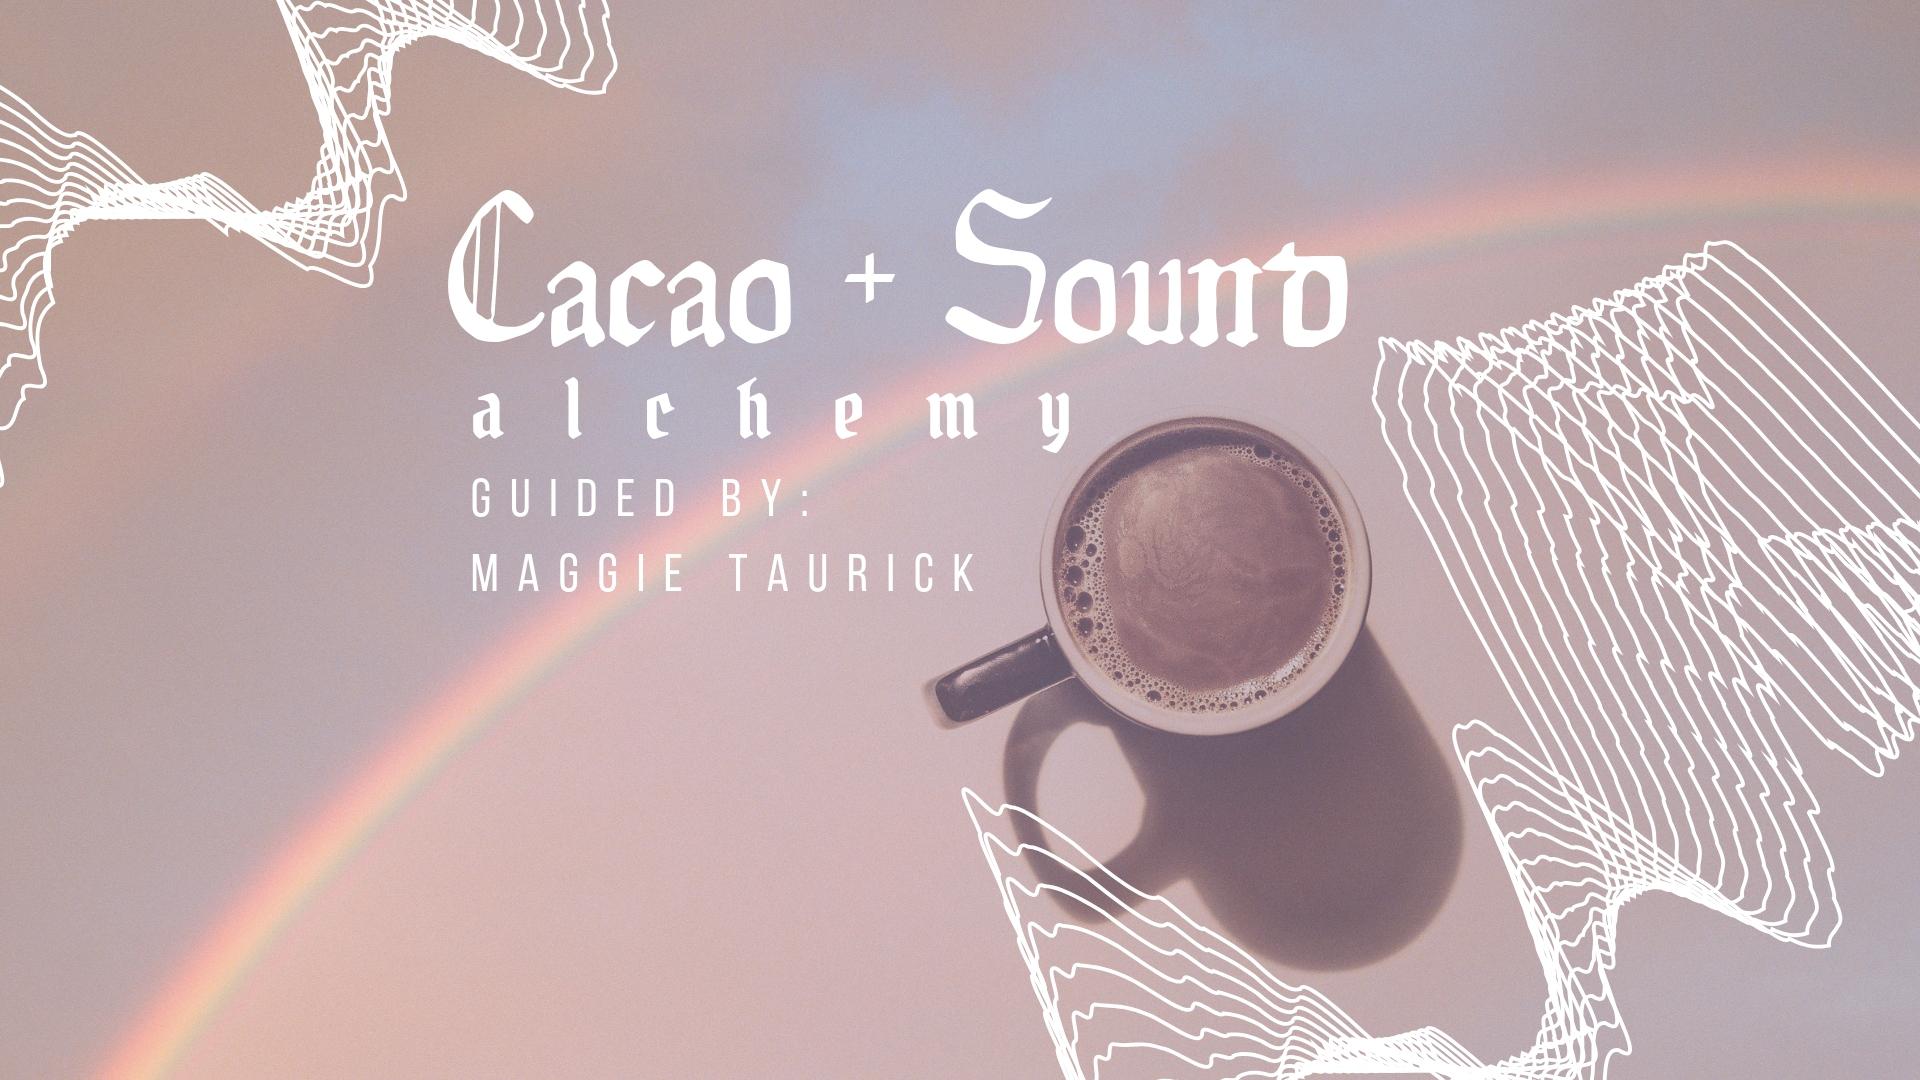 cacao-sound-alchemy-graphic.jpg